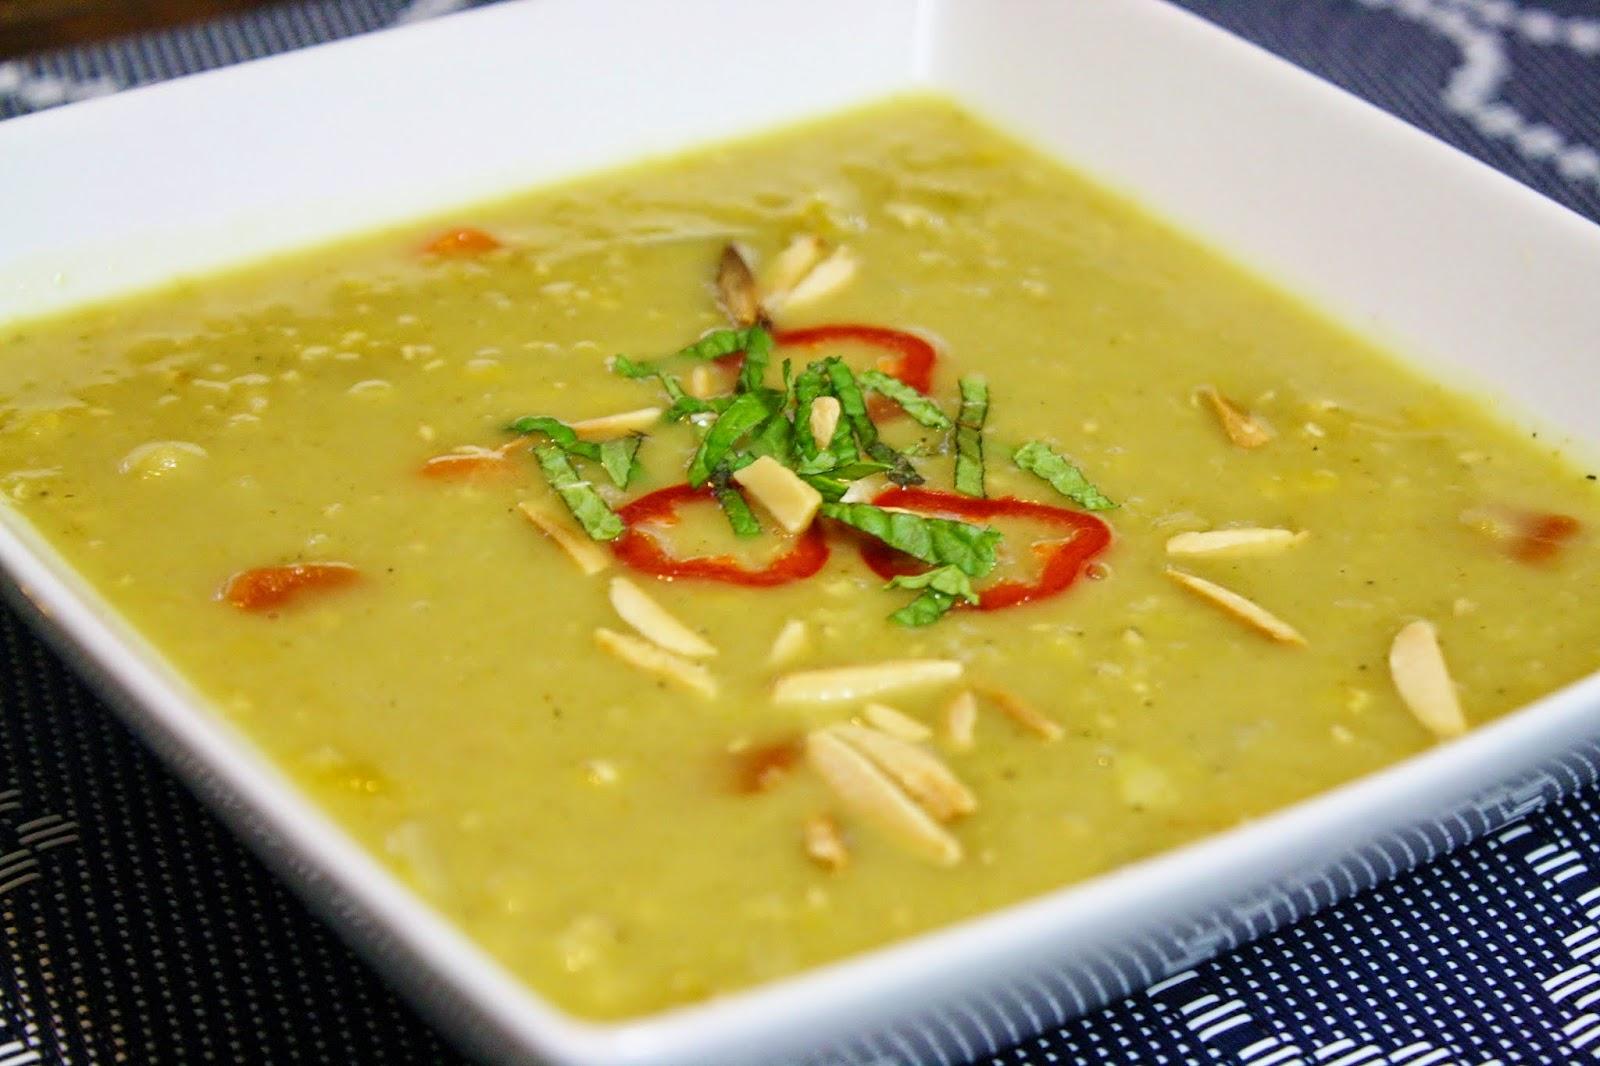 http://www.eatprayjuice.us/2015/03/slow-cooker-coconut-curry-lentil-soup.html